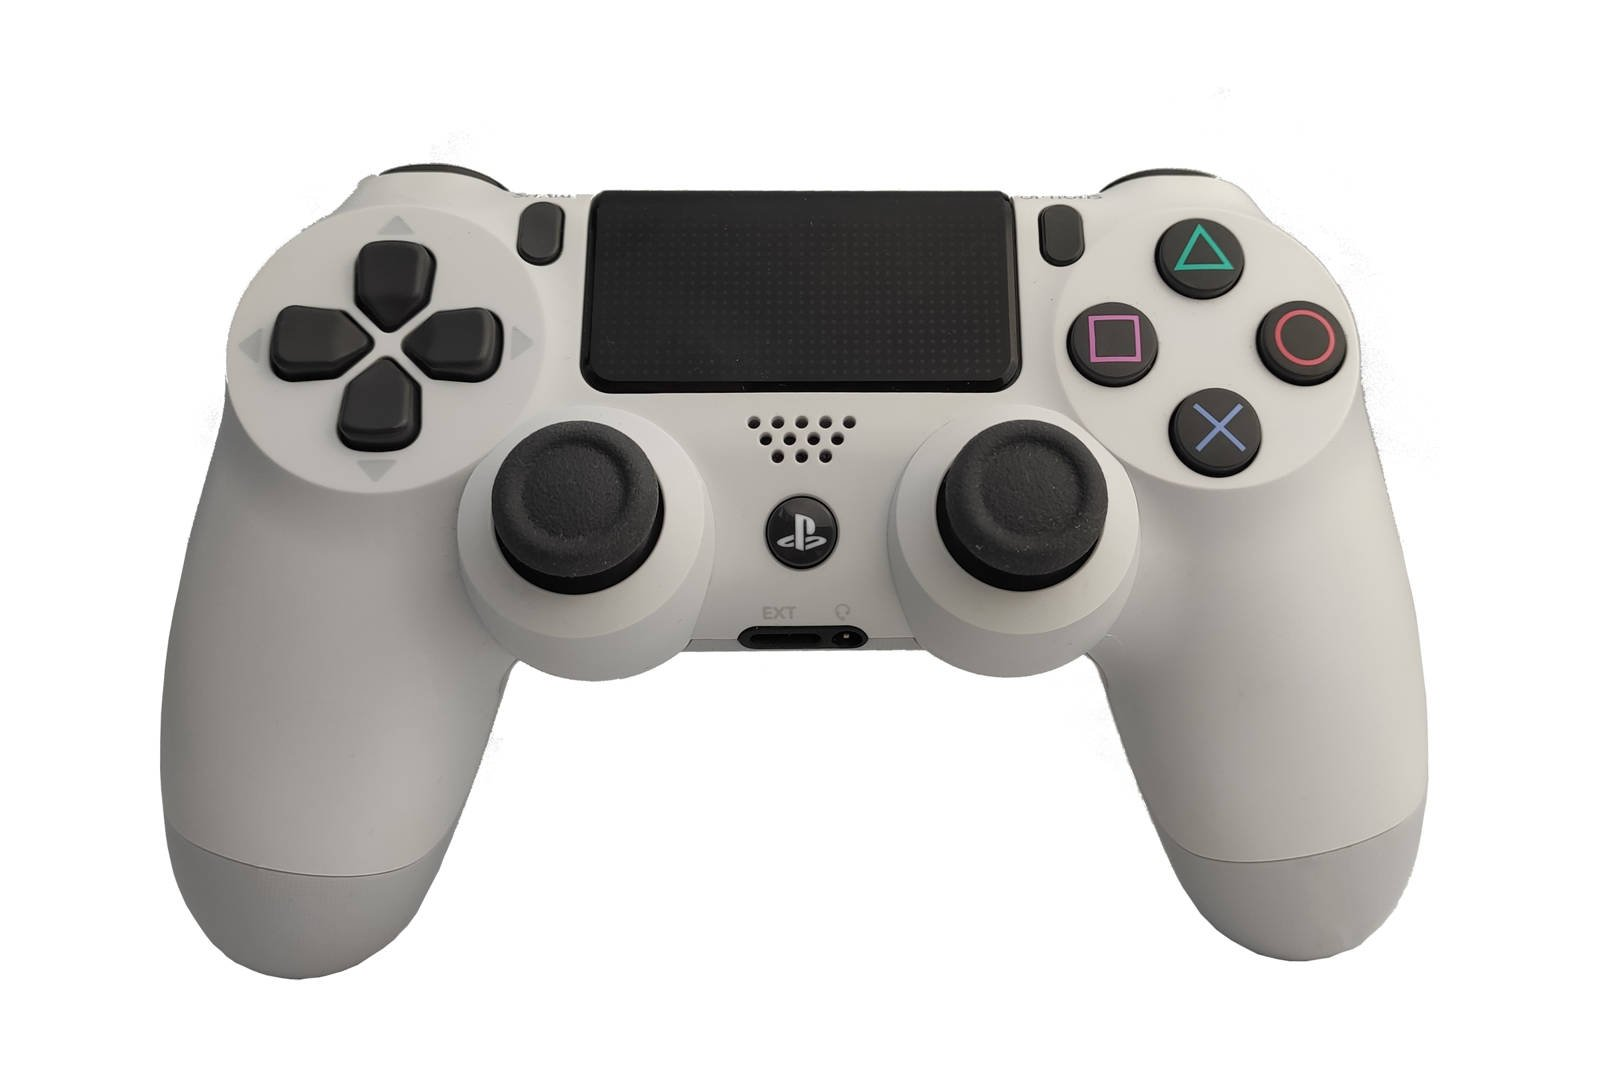 Controller Gamepad Playstation 4 PS4 v2 Glacier White